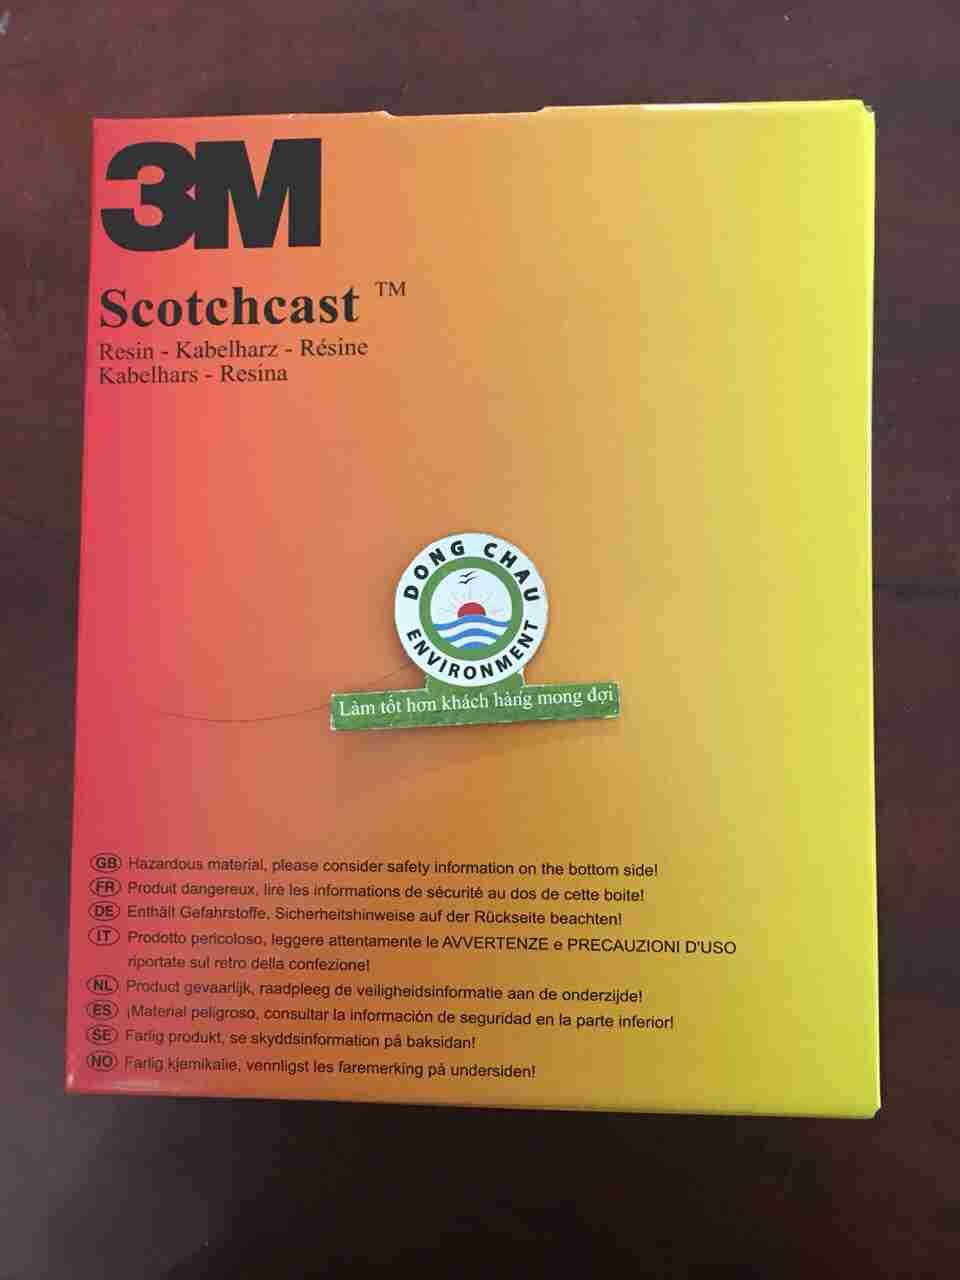 Keo 3M resin scotchcast 40